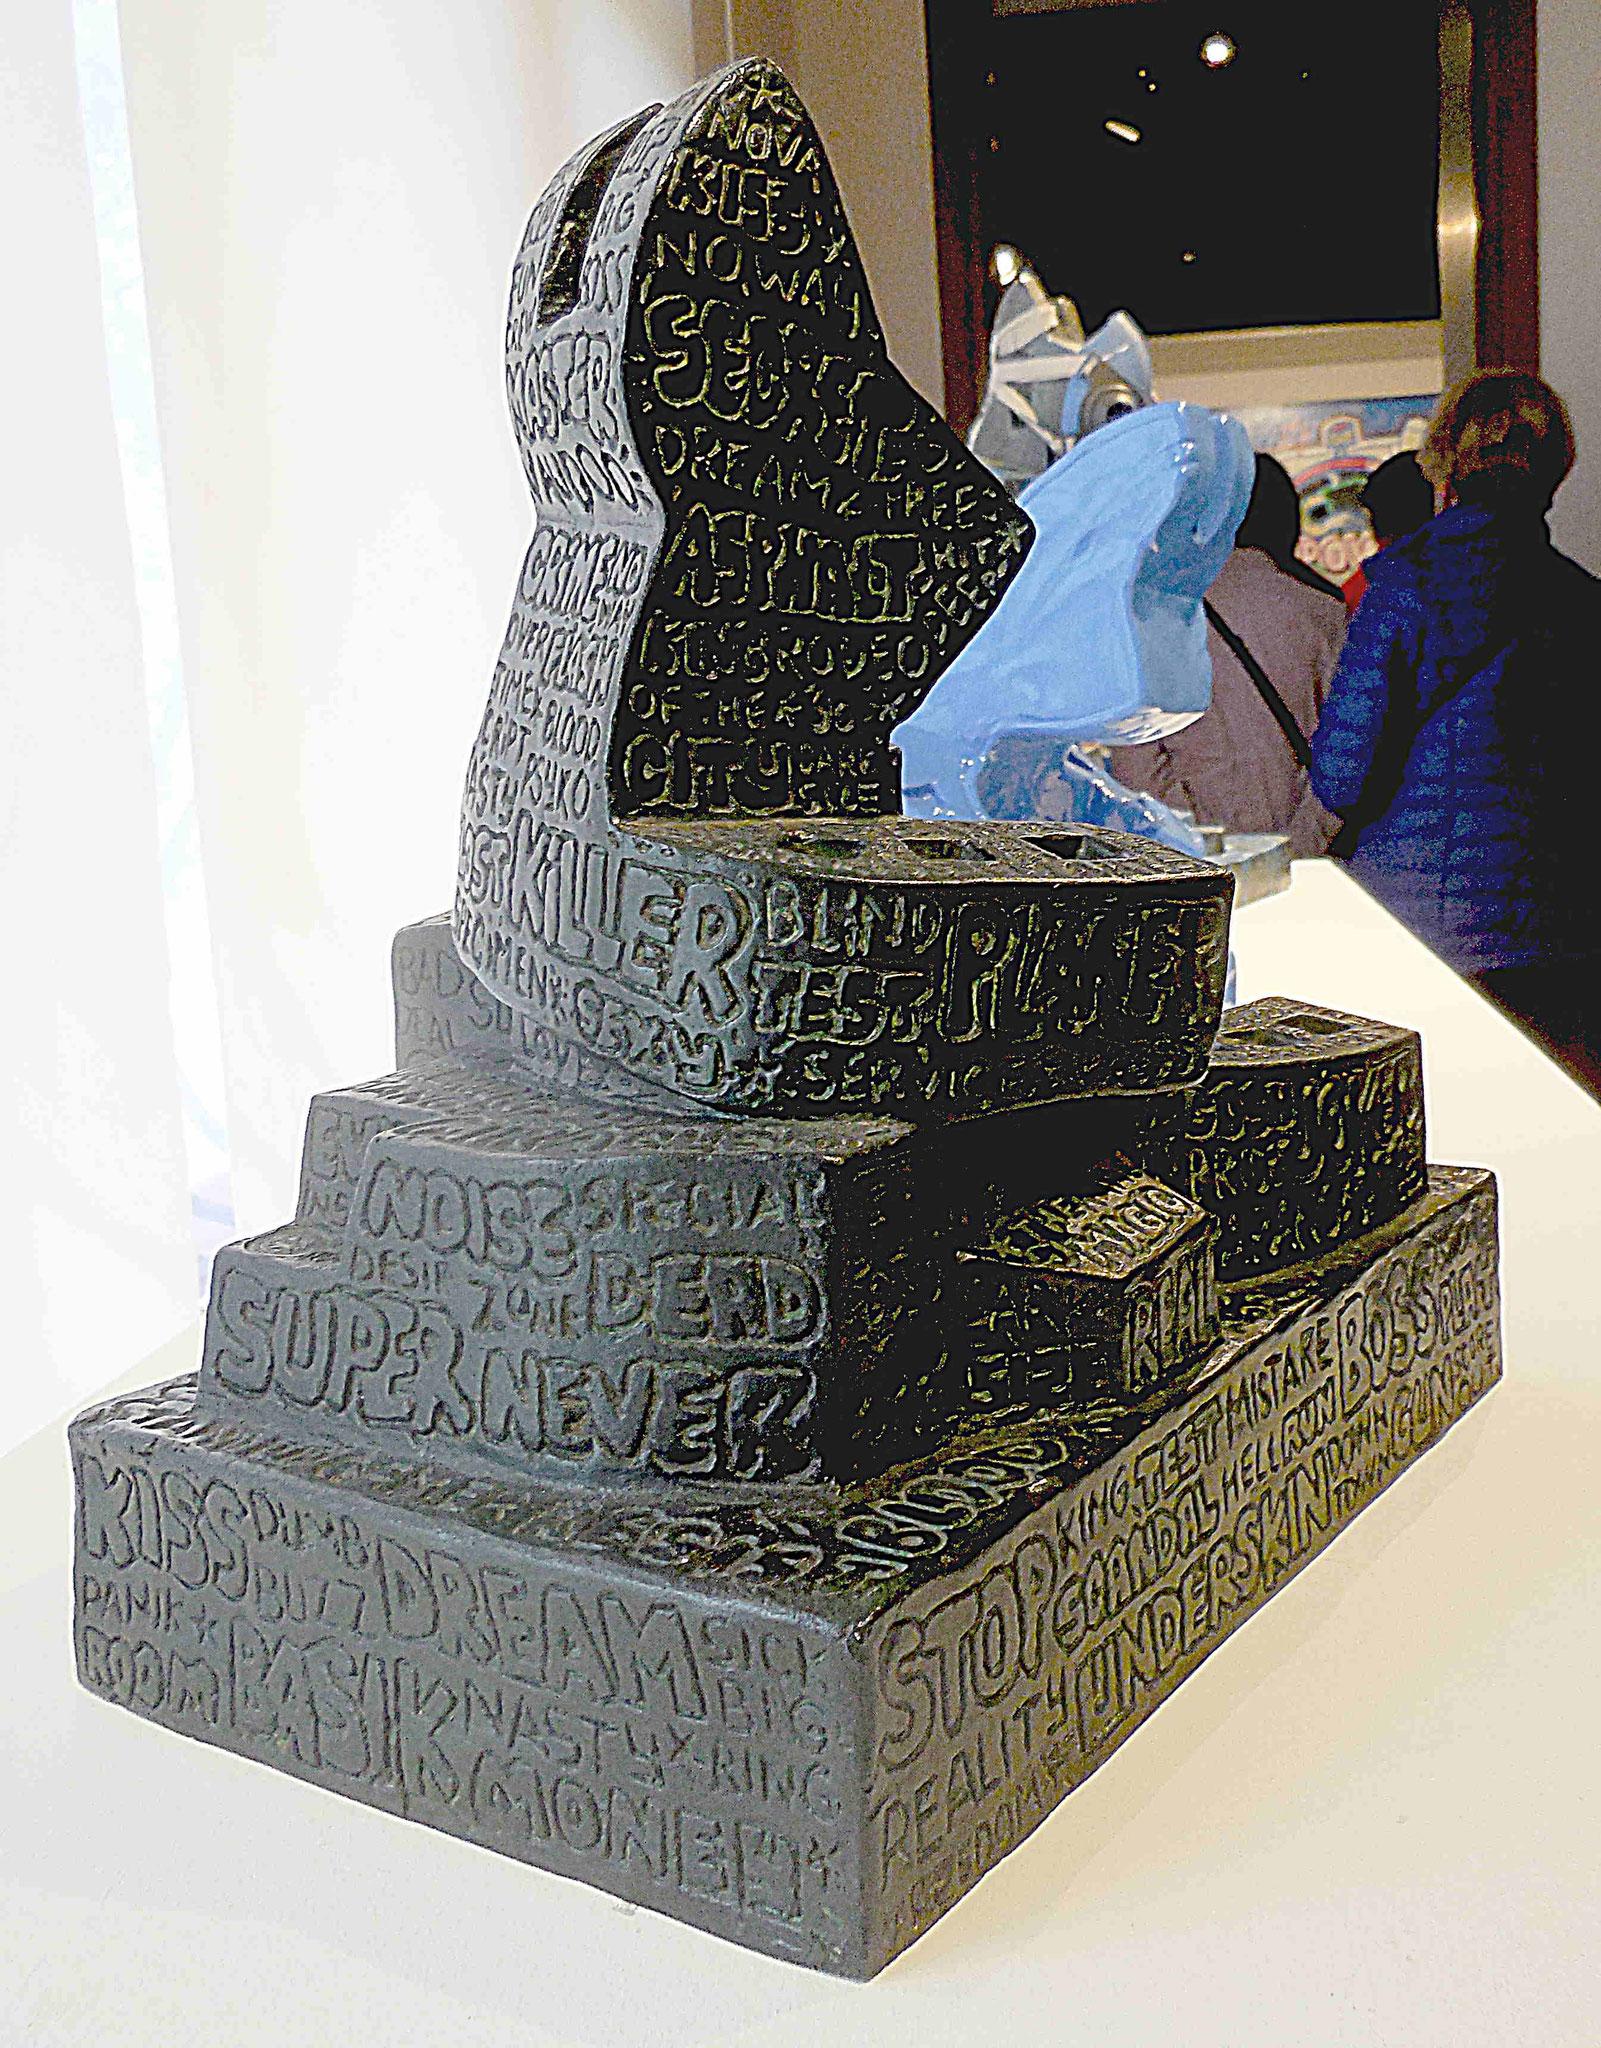 Lapinture incisé, sculpture métal